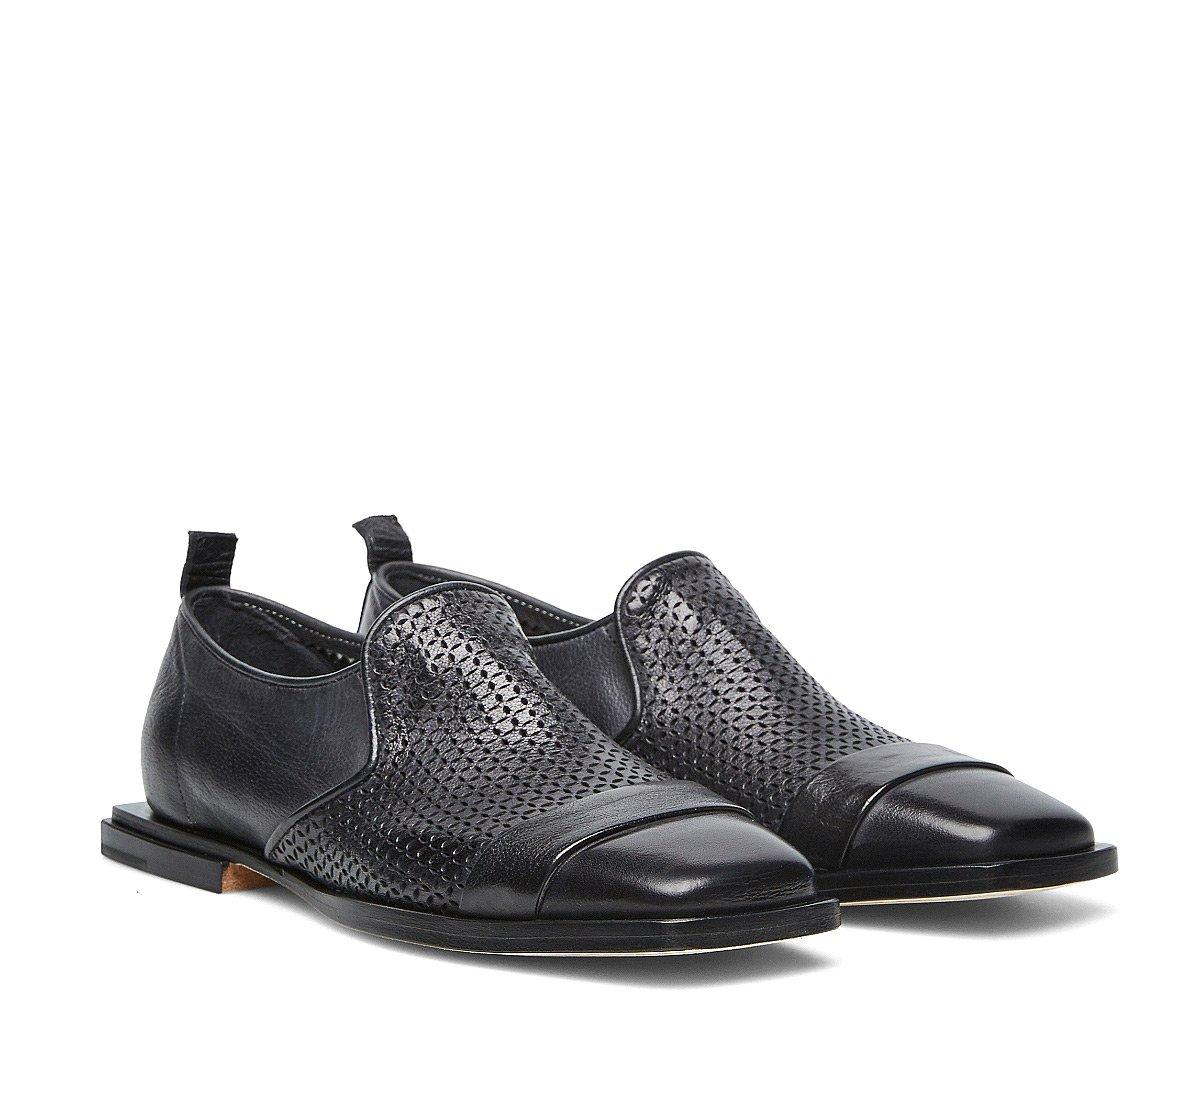 Barracuda vintage-style shoes